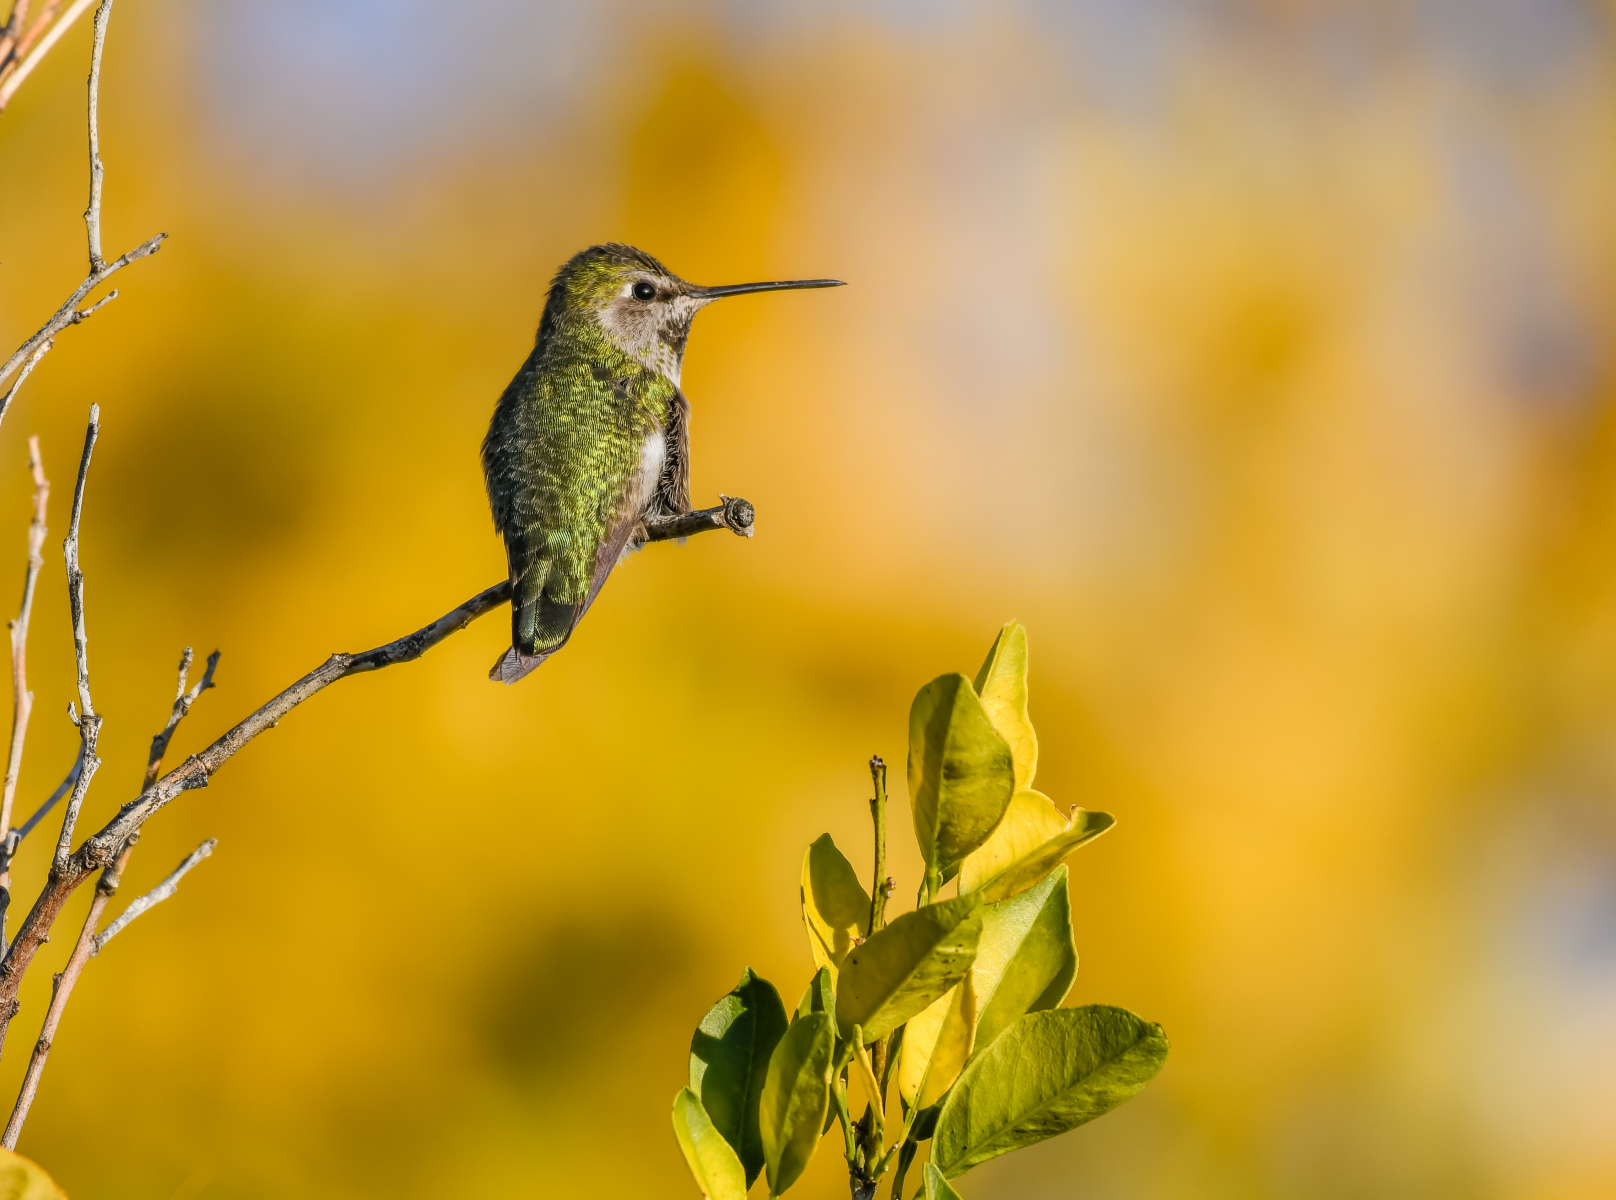 Anna's Hummingbird by Jill Tierney